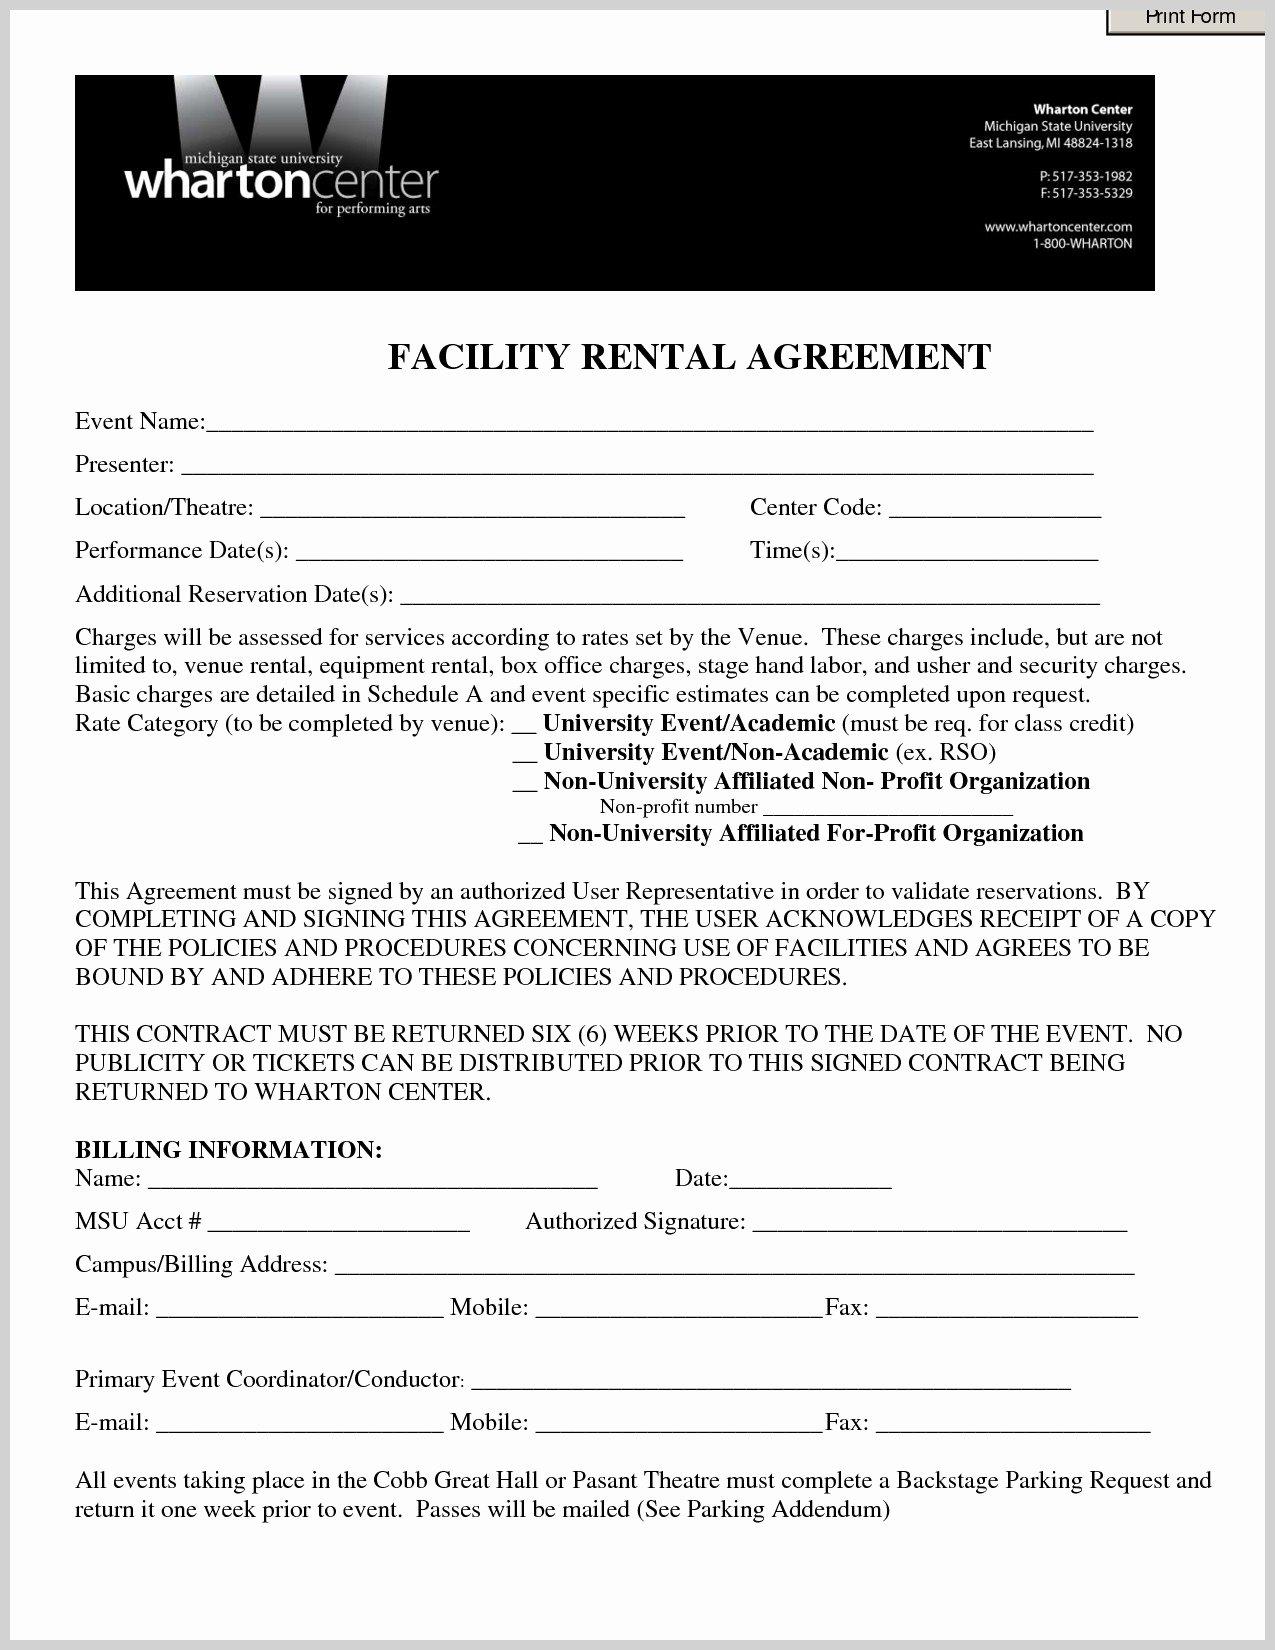 Venue Rental Agreement Template Best Of Venue Contract Template event Contract Template